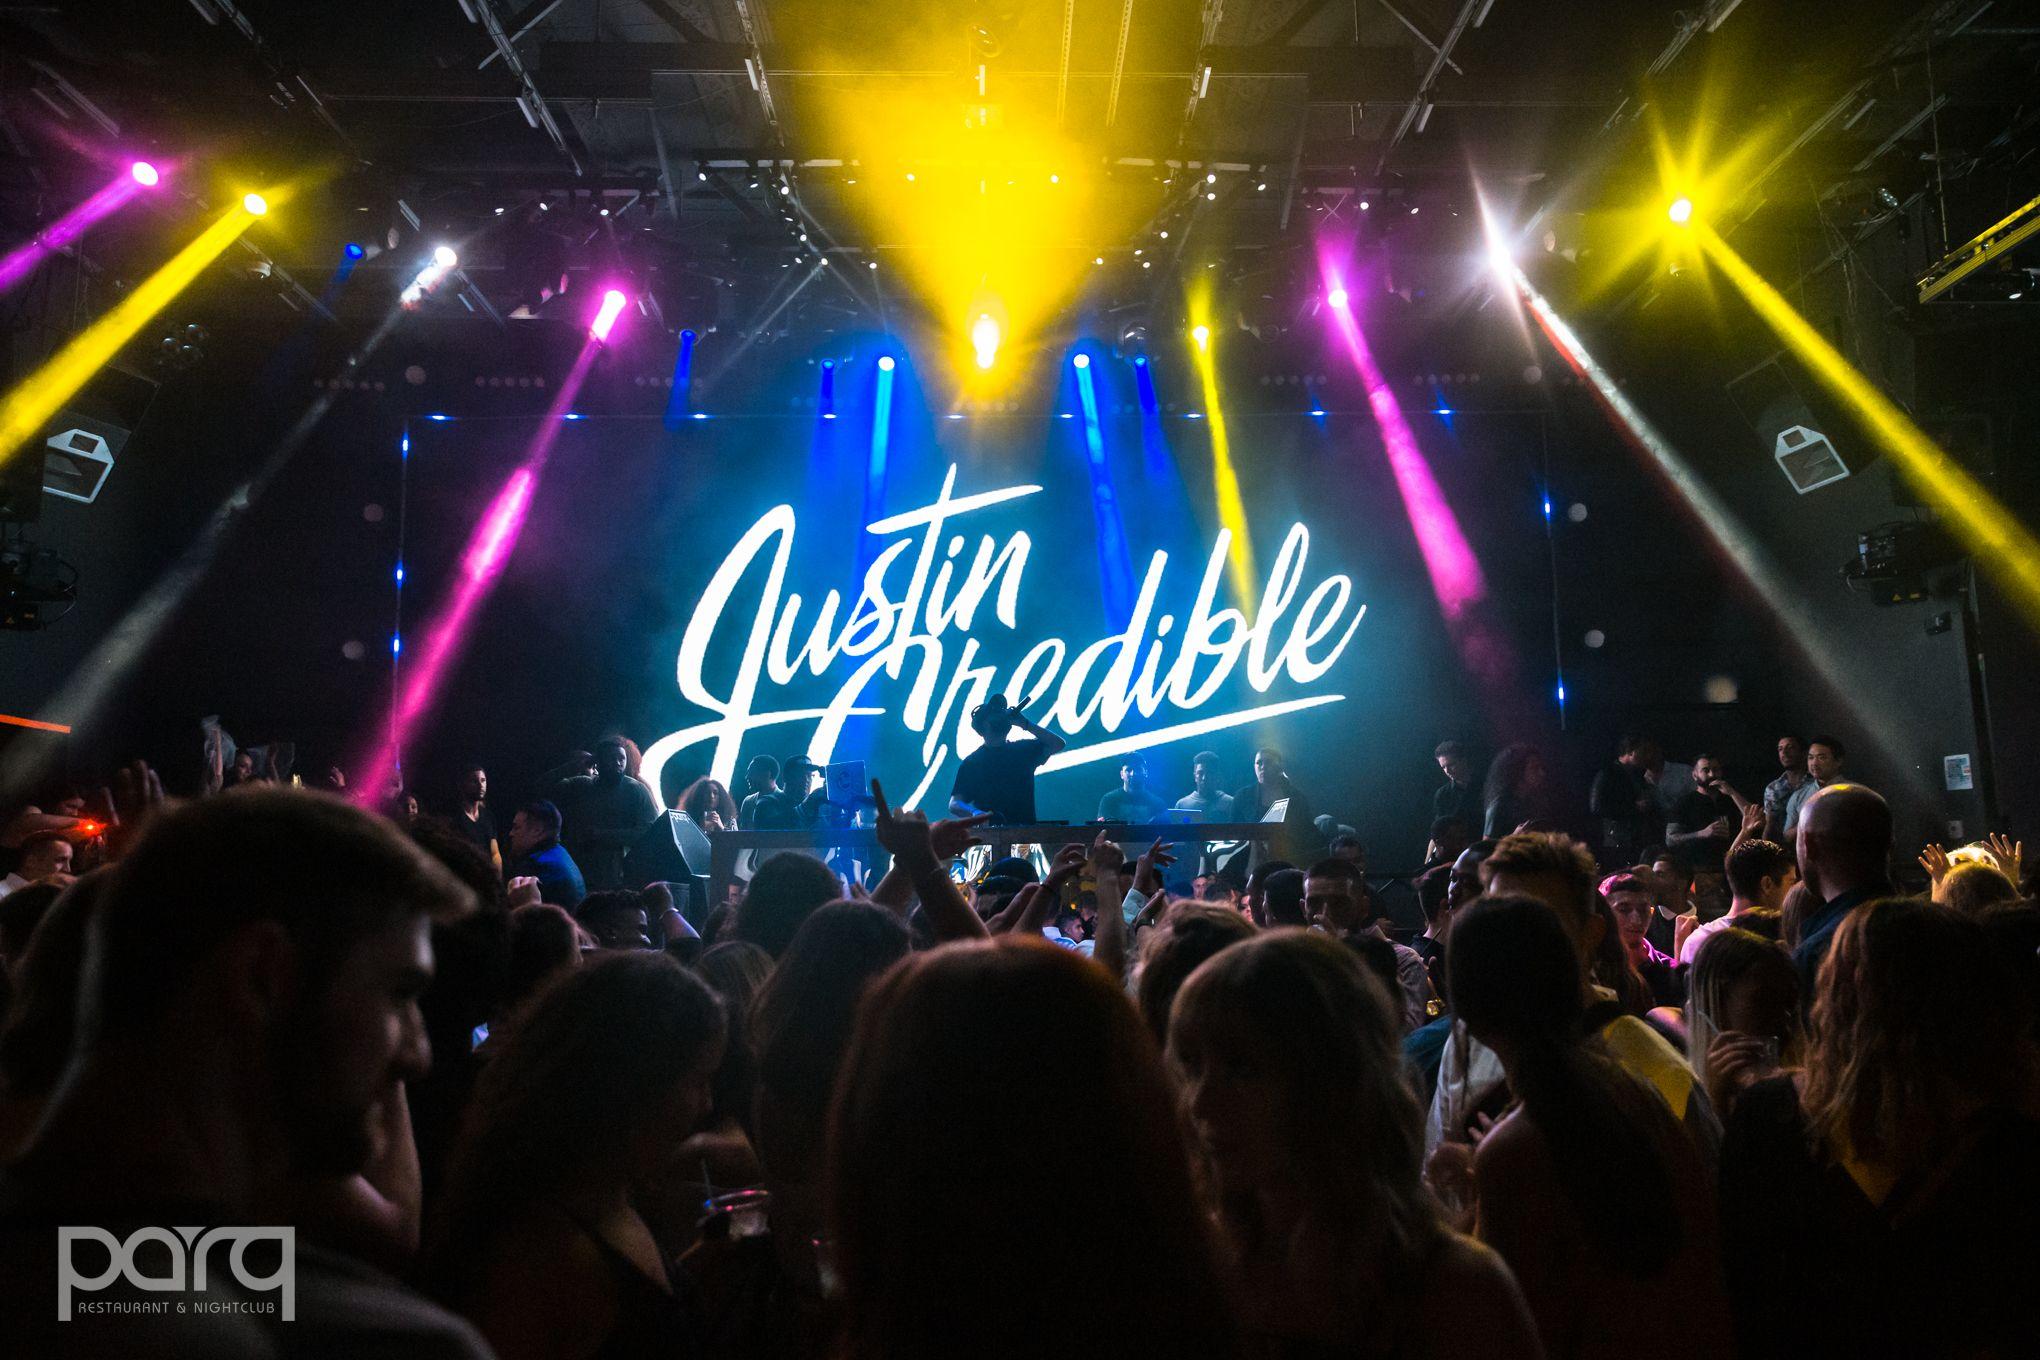 09.28.19 Parq - Justin Credible-11.jpg